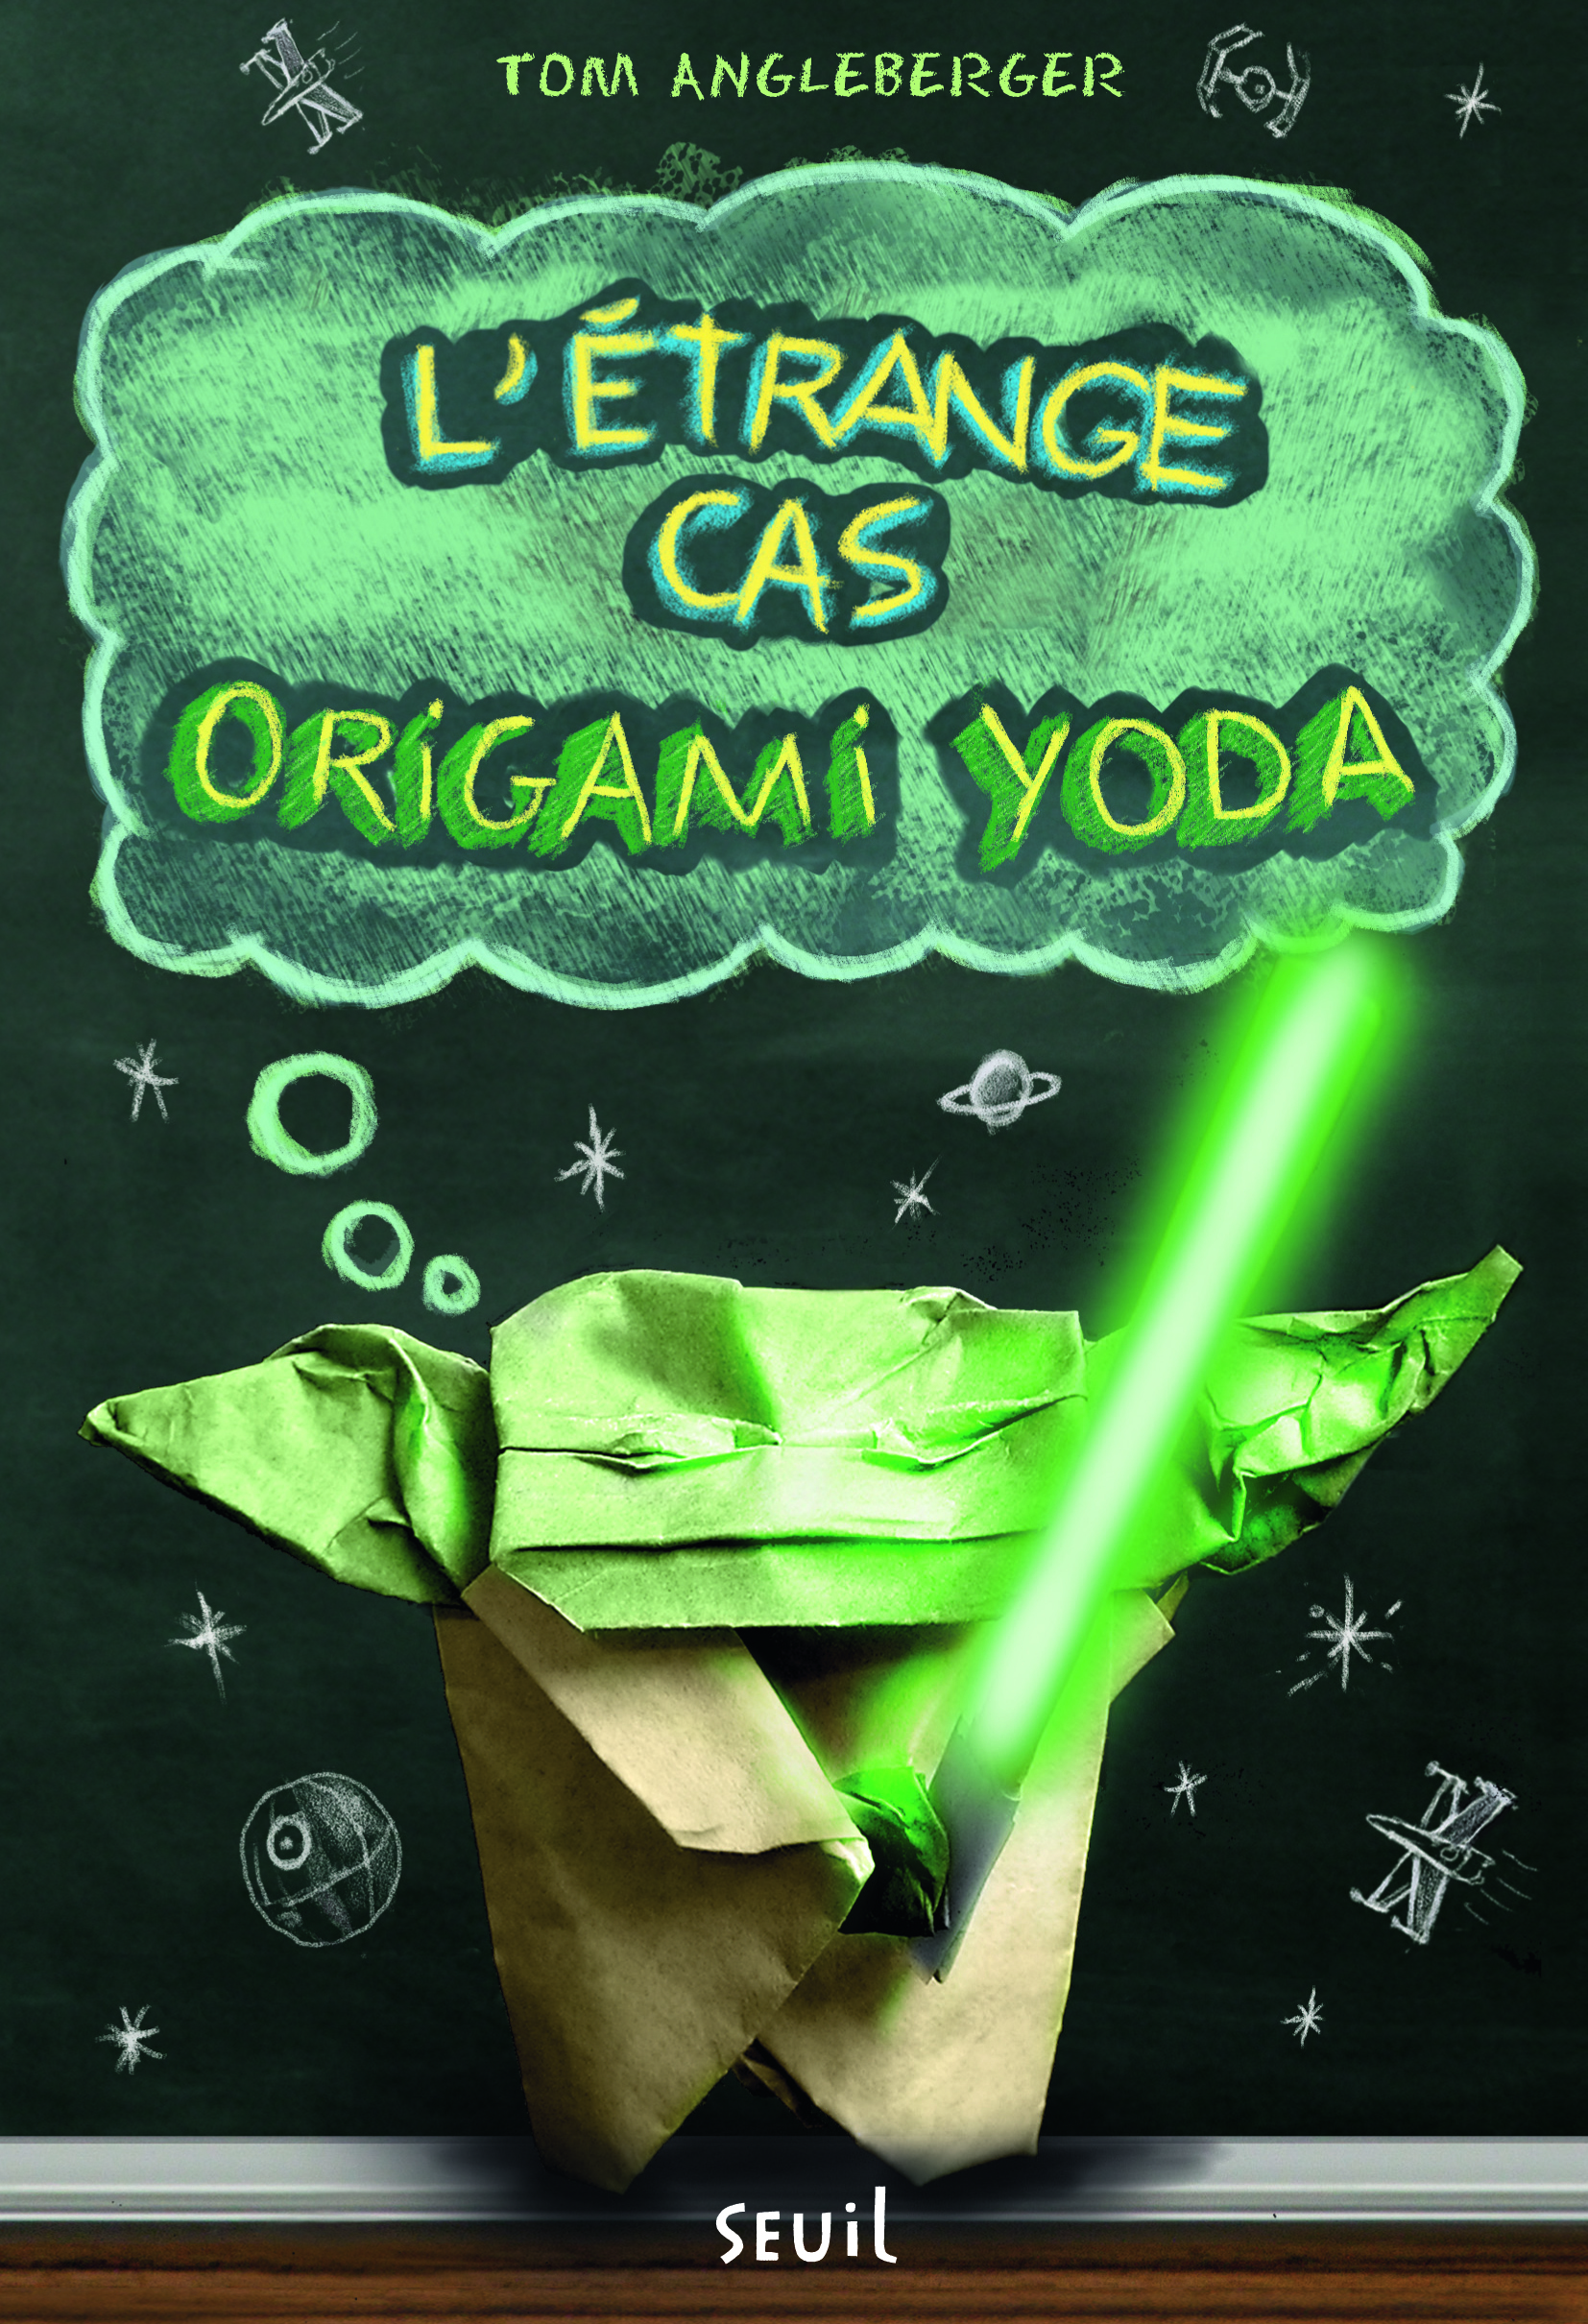 L'ETRANGE CAS ORIGAMI YODA. ORIGAMI YODA, TOME 1 - VOL1